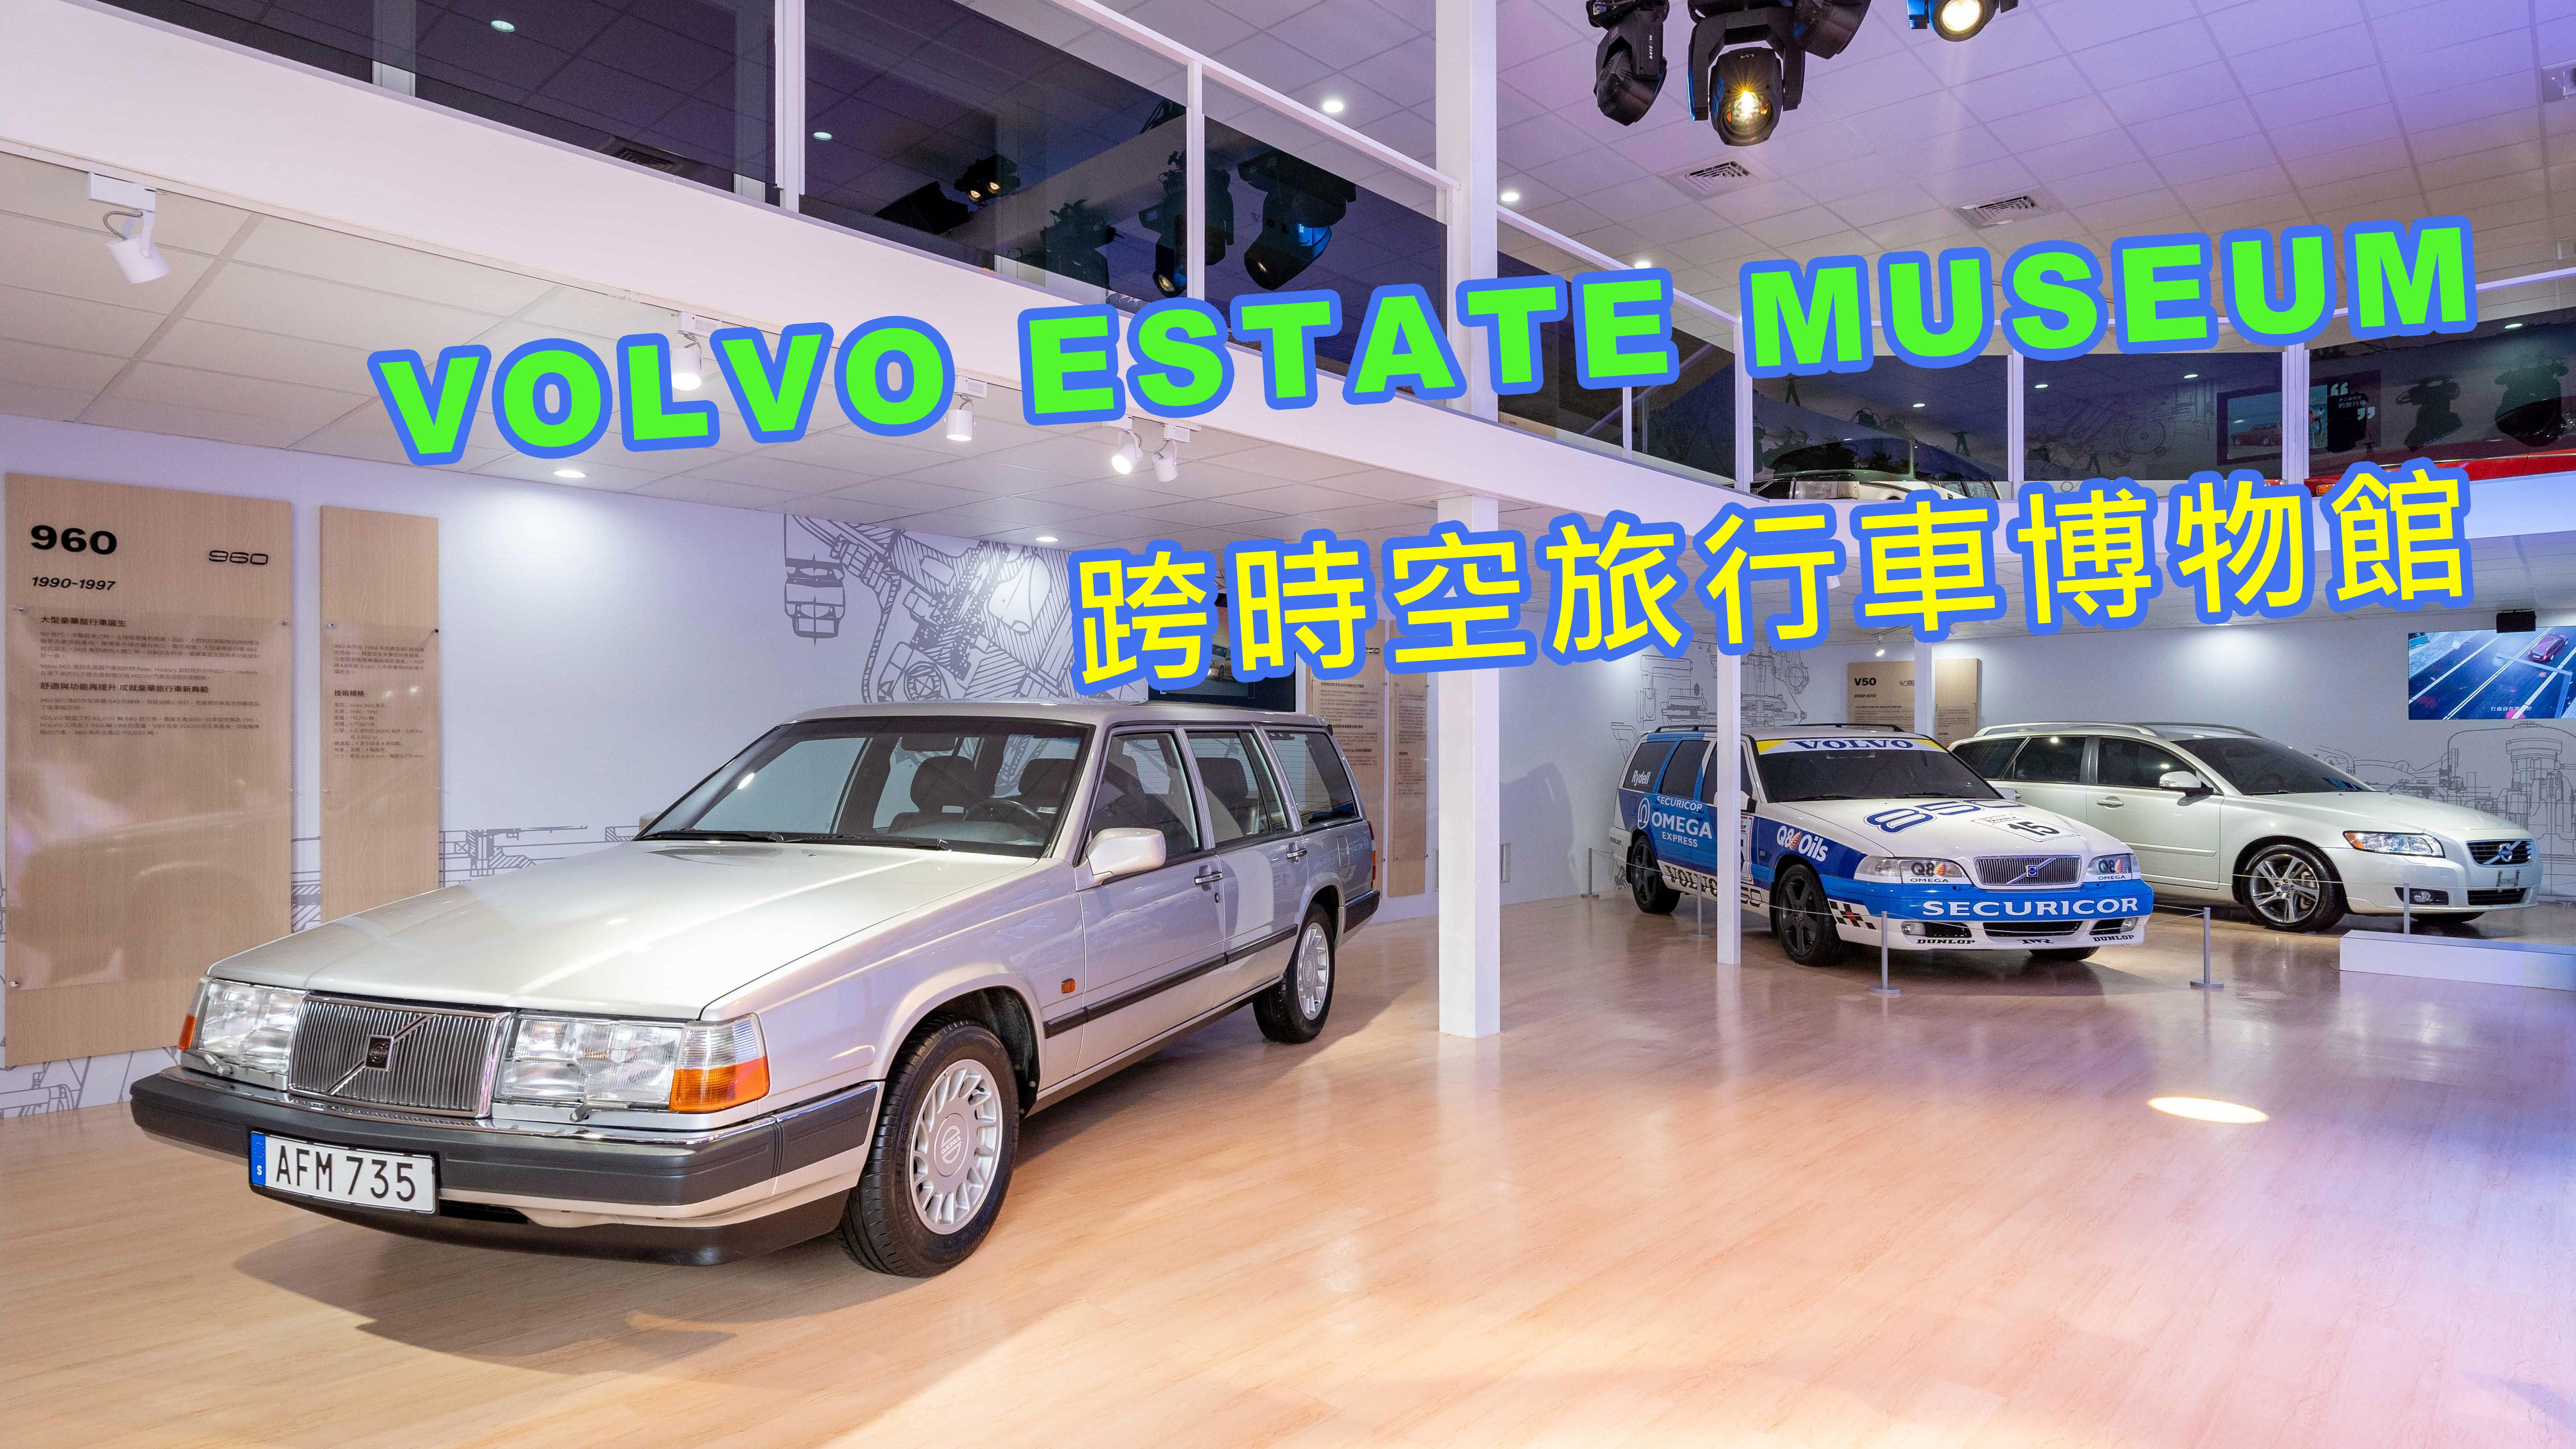 Volvo 經典旅行相聚一堂|Volvo Estate Museum 跨時空旅行車博物館